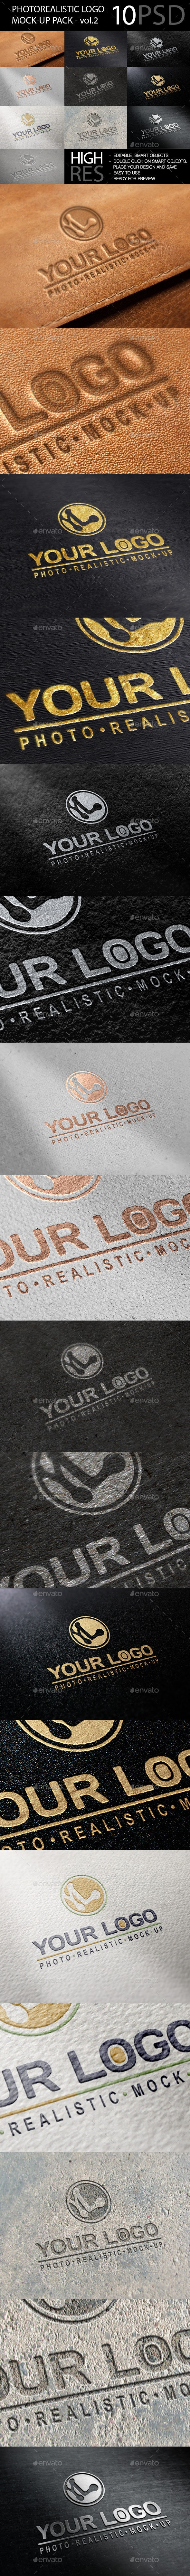 Photo realistic Logo Mockup Pack Vol.2  - Logo Product Mock-Ups